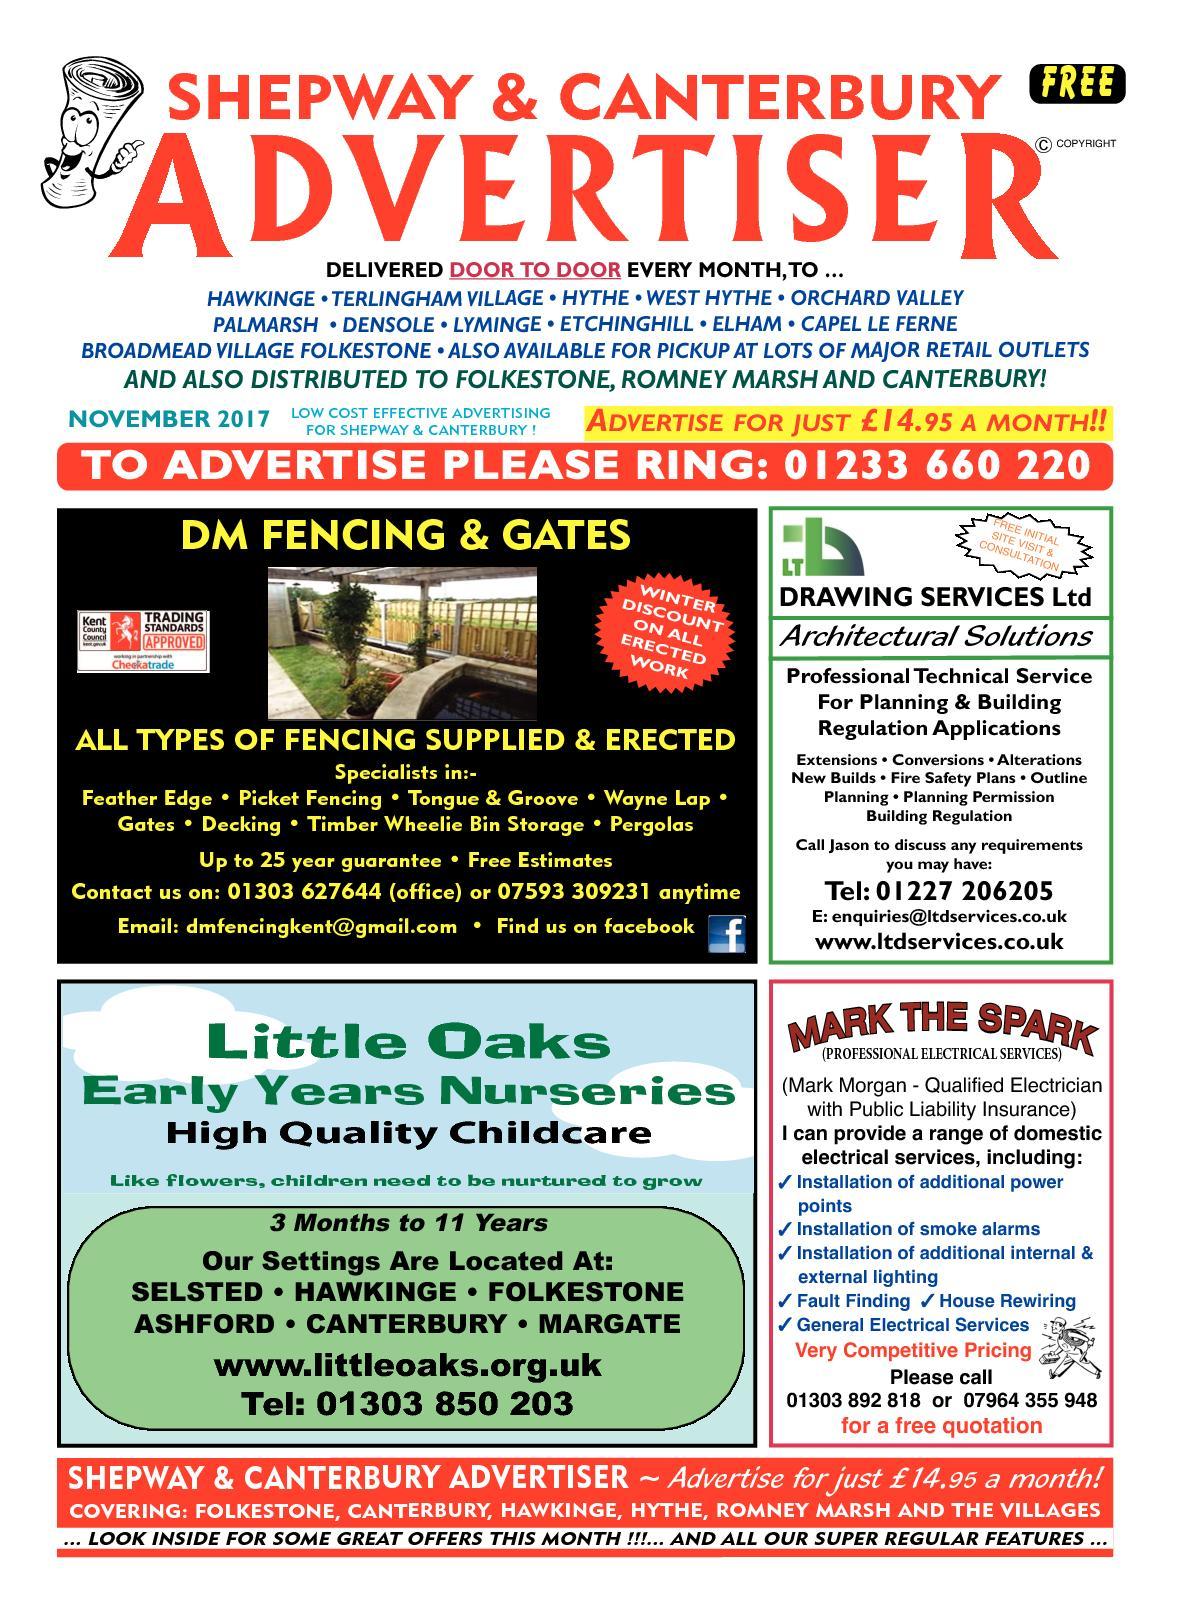 Calamo Shepway And Canterbury Advertiser Niceic Type Wiring Codes